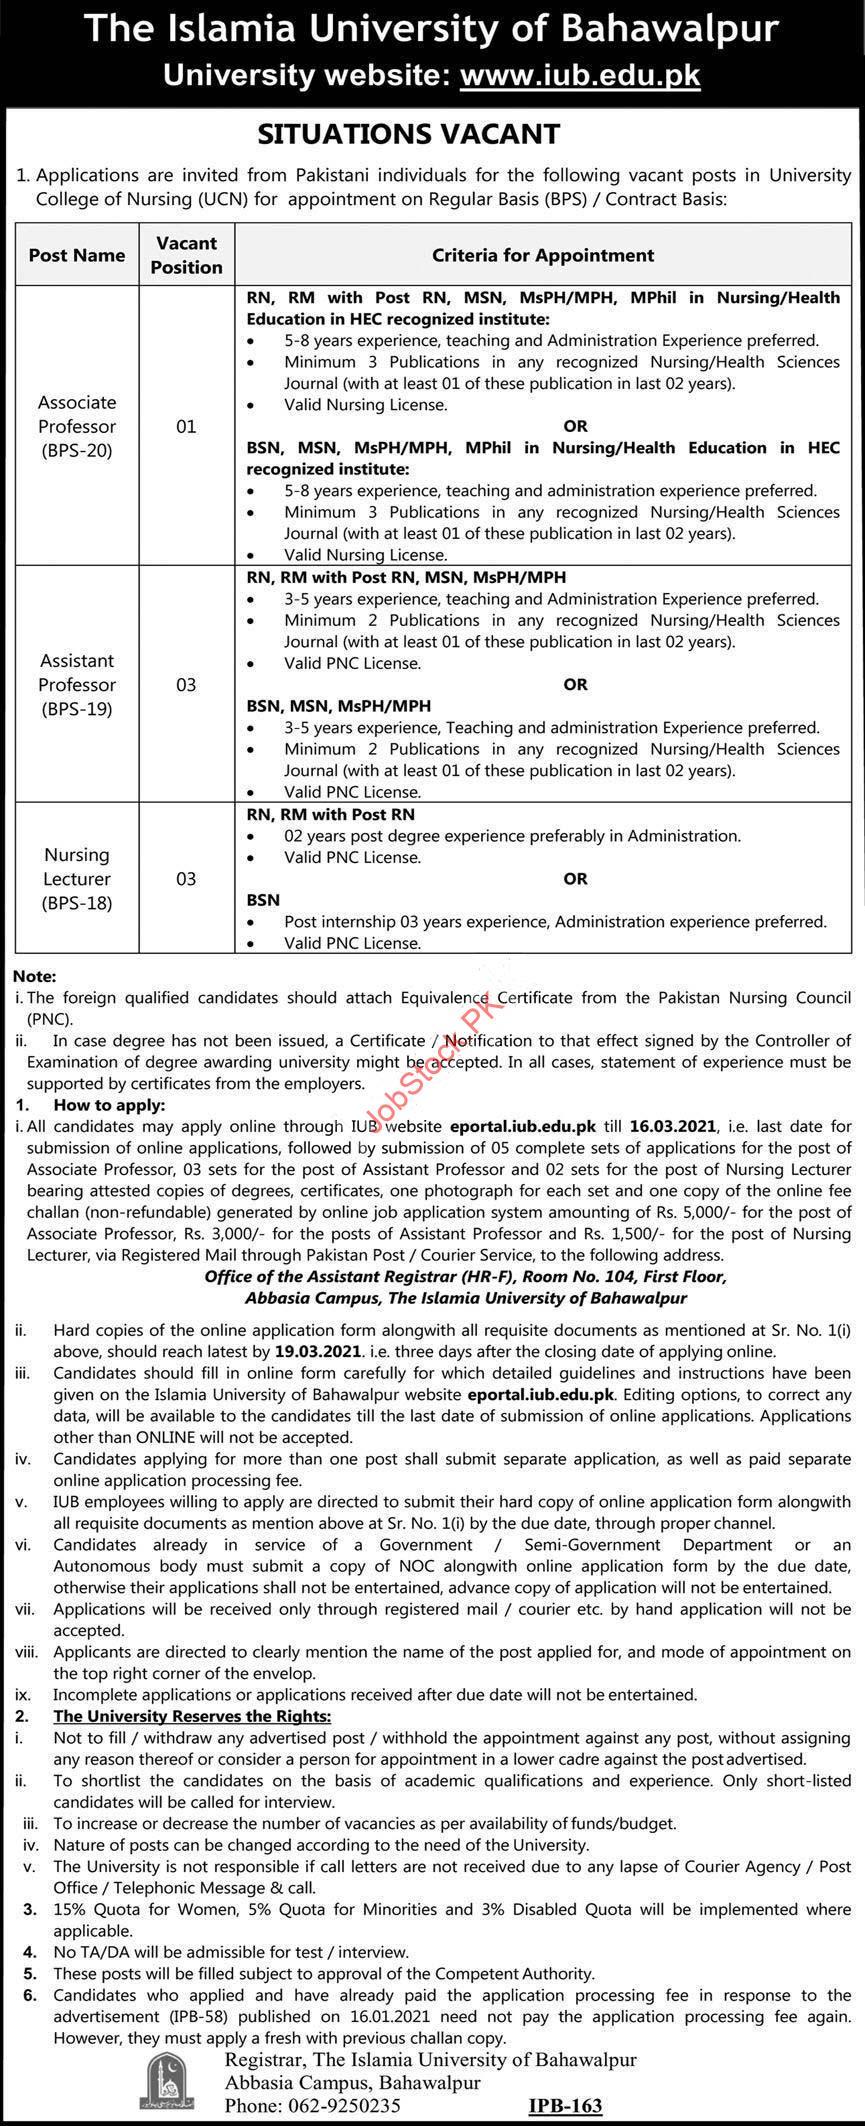 The Islamia University Of Bahawalpur Iub Jobs 2021 Latest